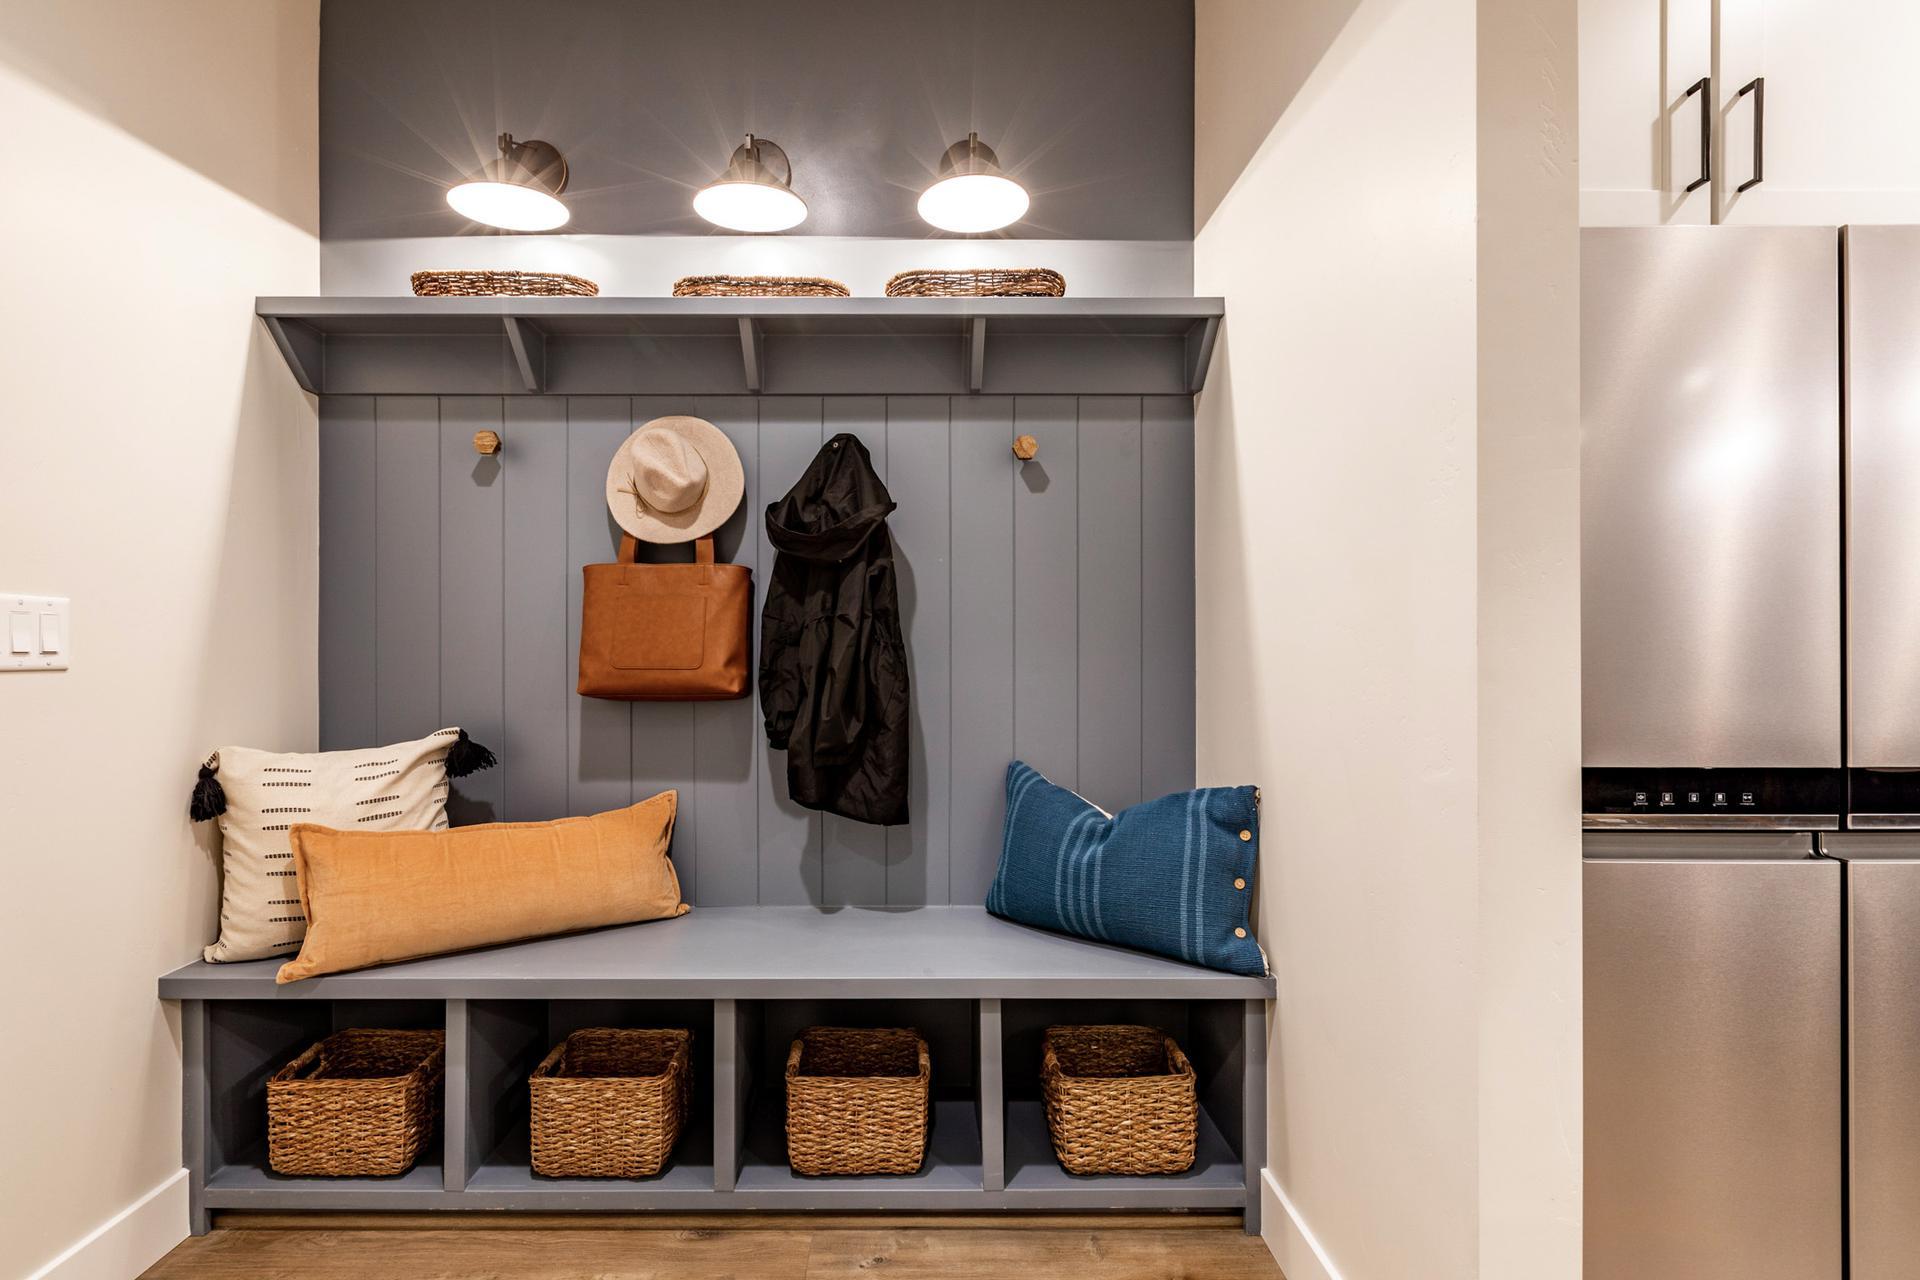 New Home Lighting Photos of Fieldstone Homes